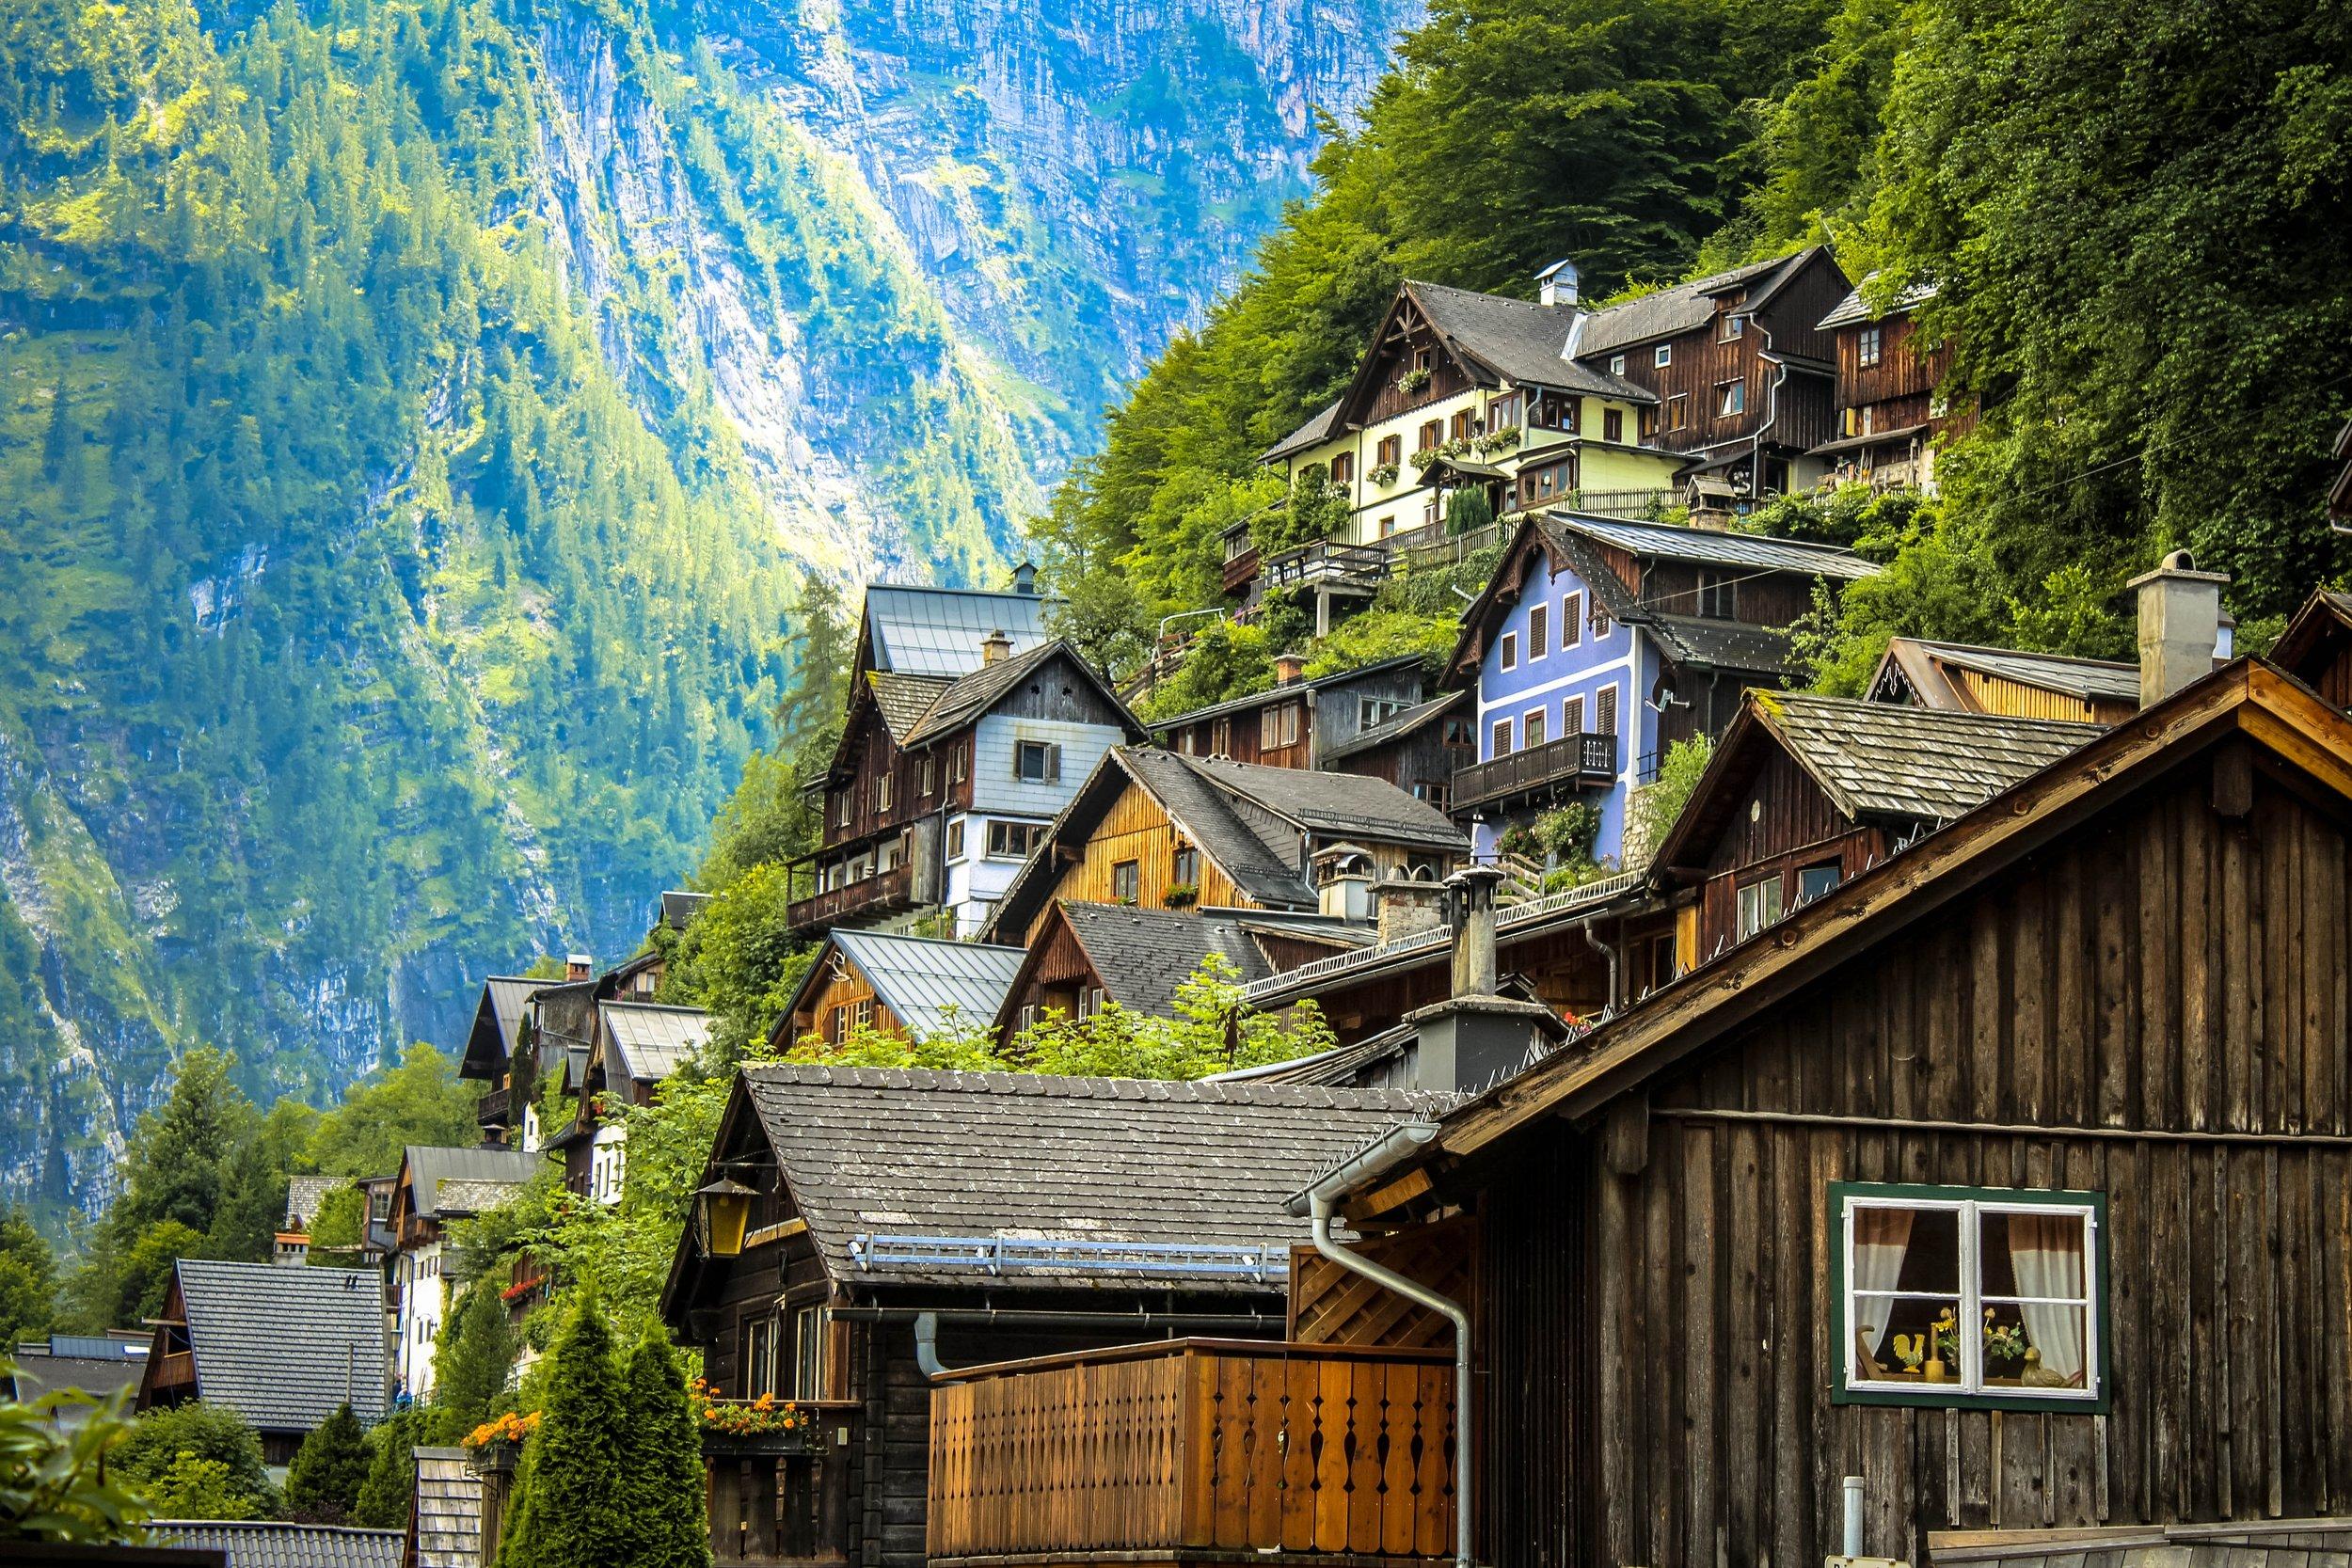 architecture-austria-beautiful-1493088 (1).jpg